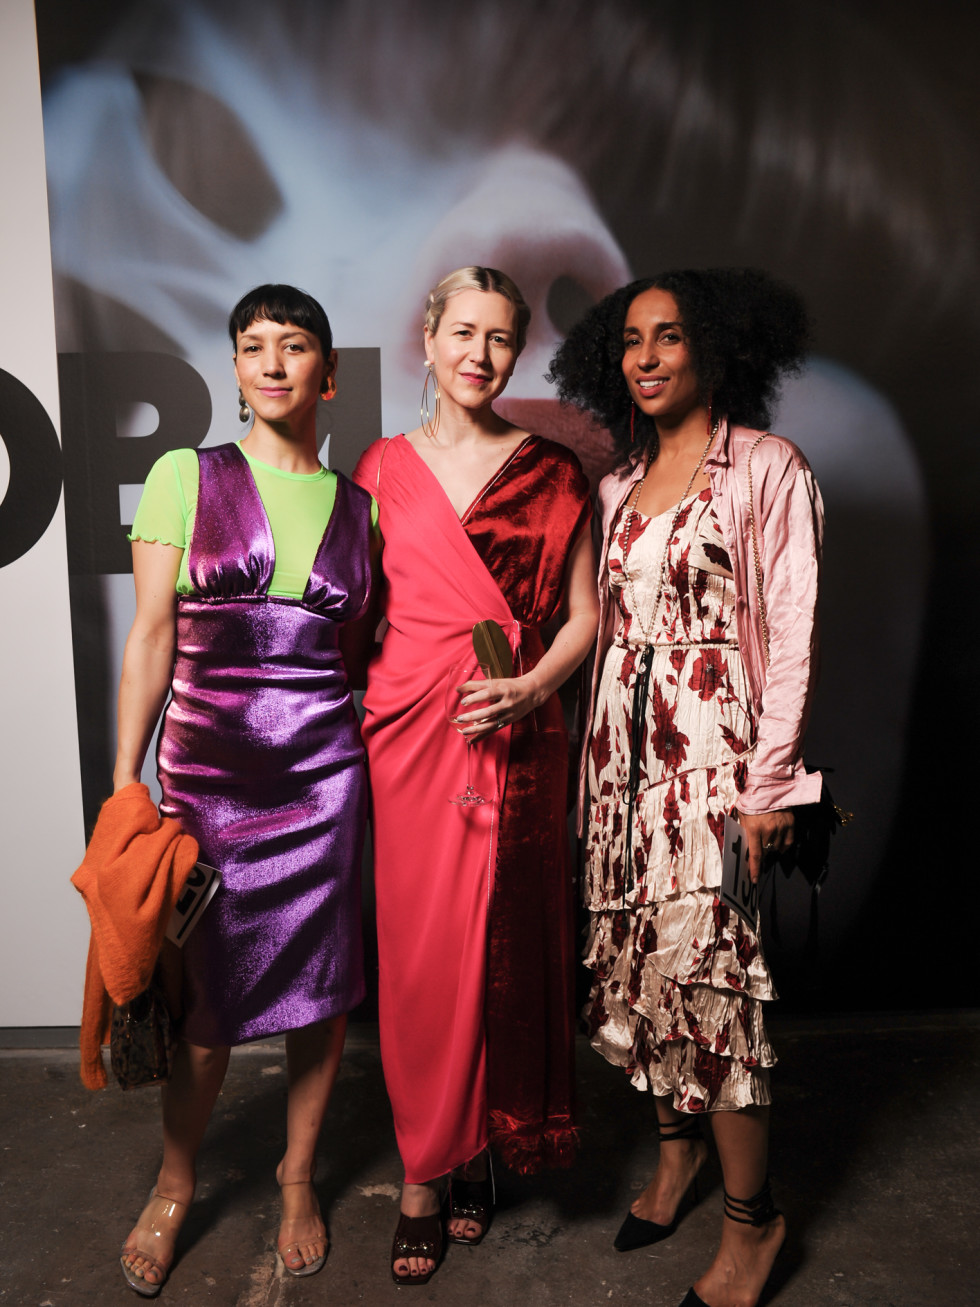 Amanda Carter, Kristen Cole, Chioma Nnadi